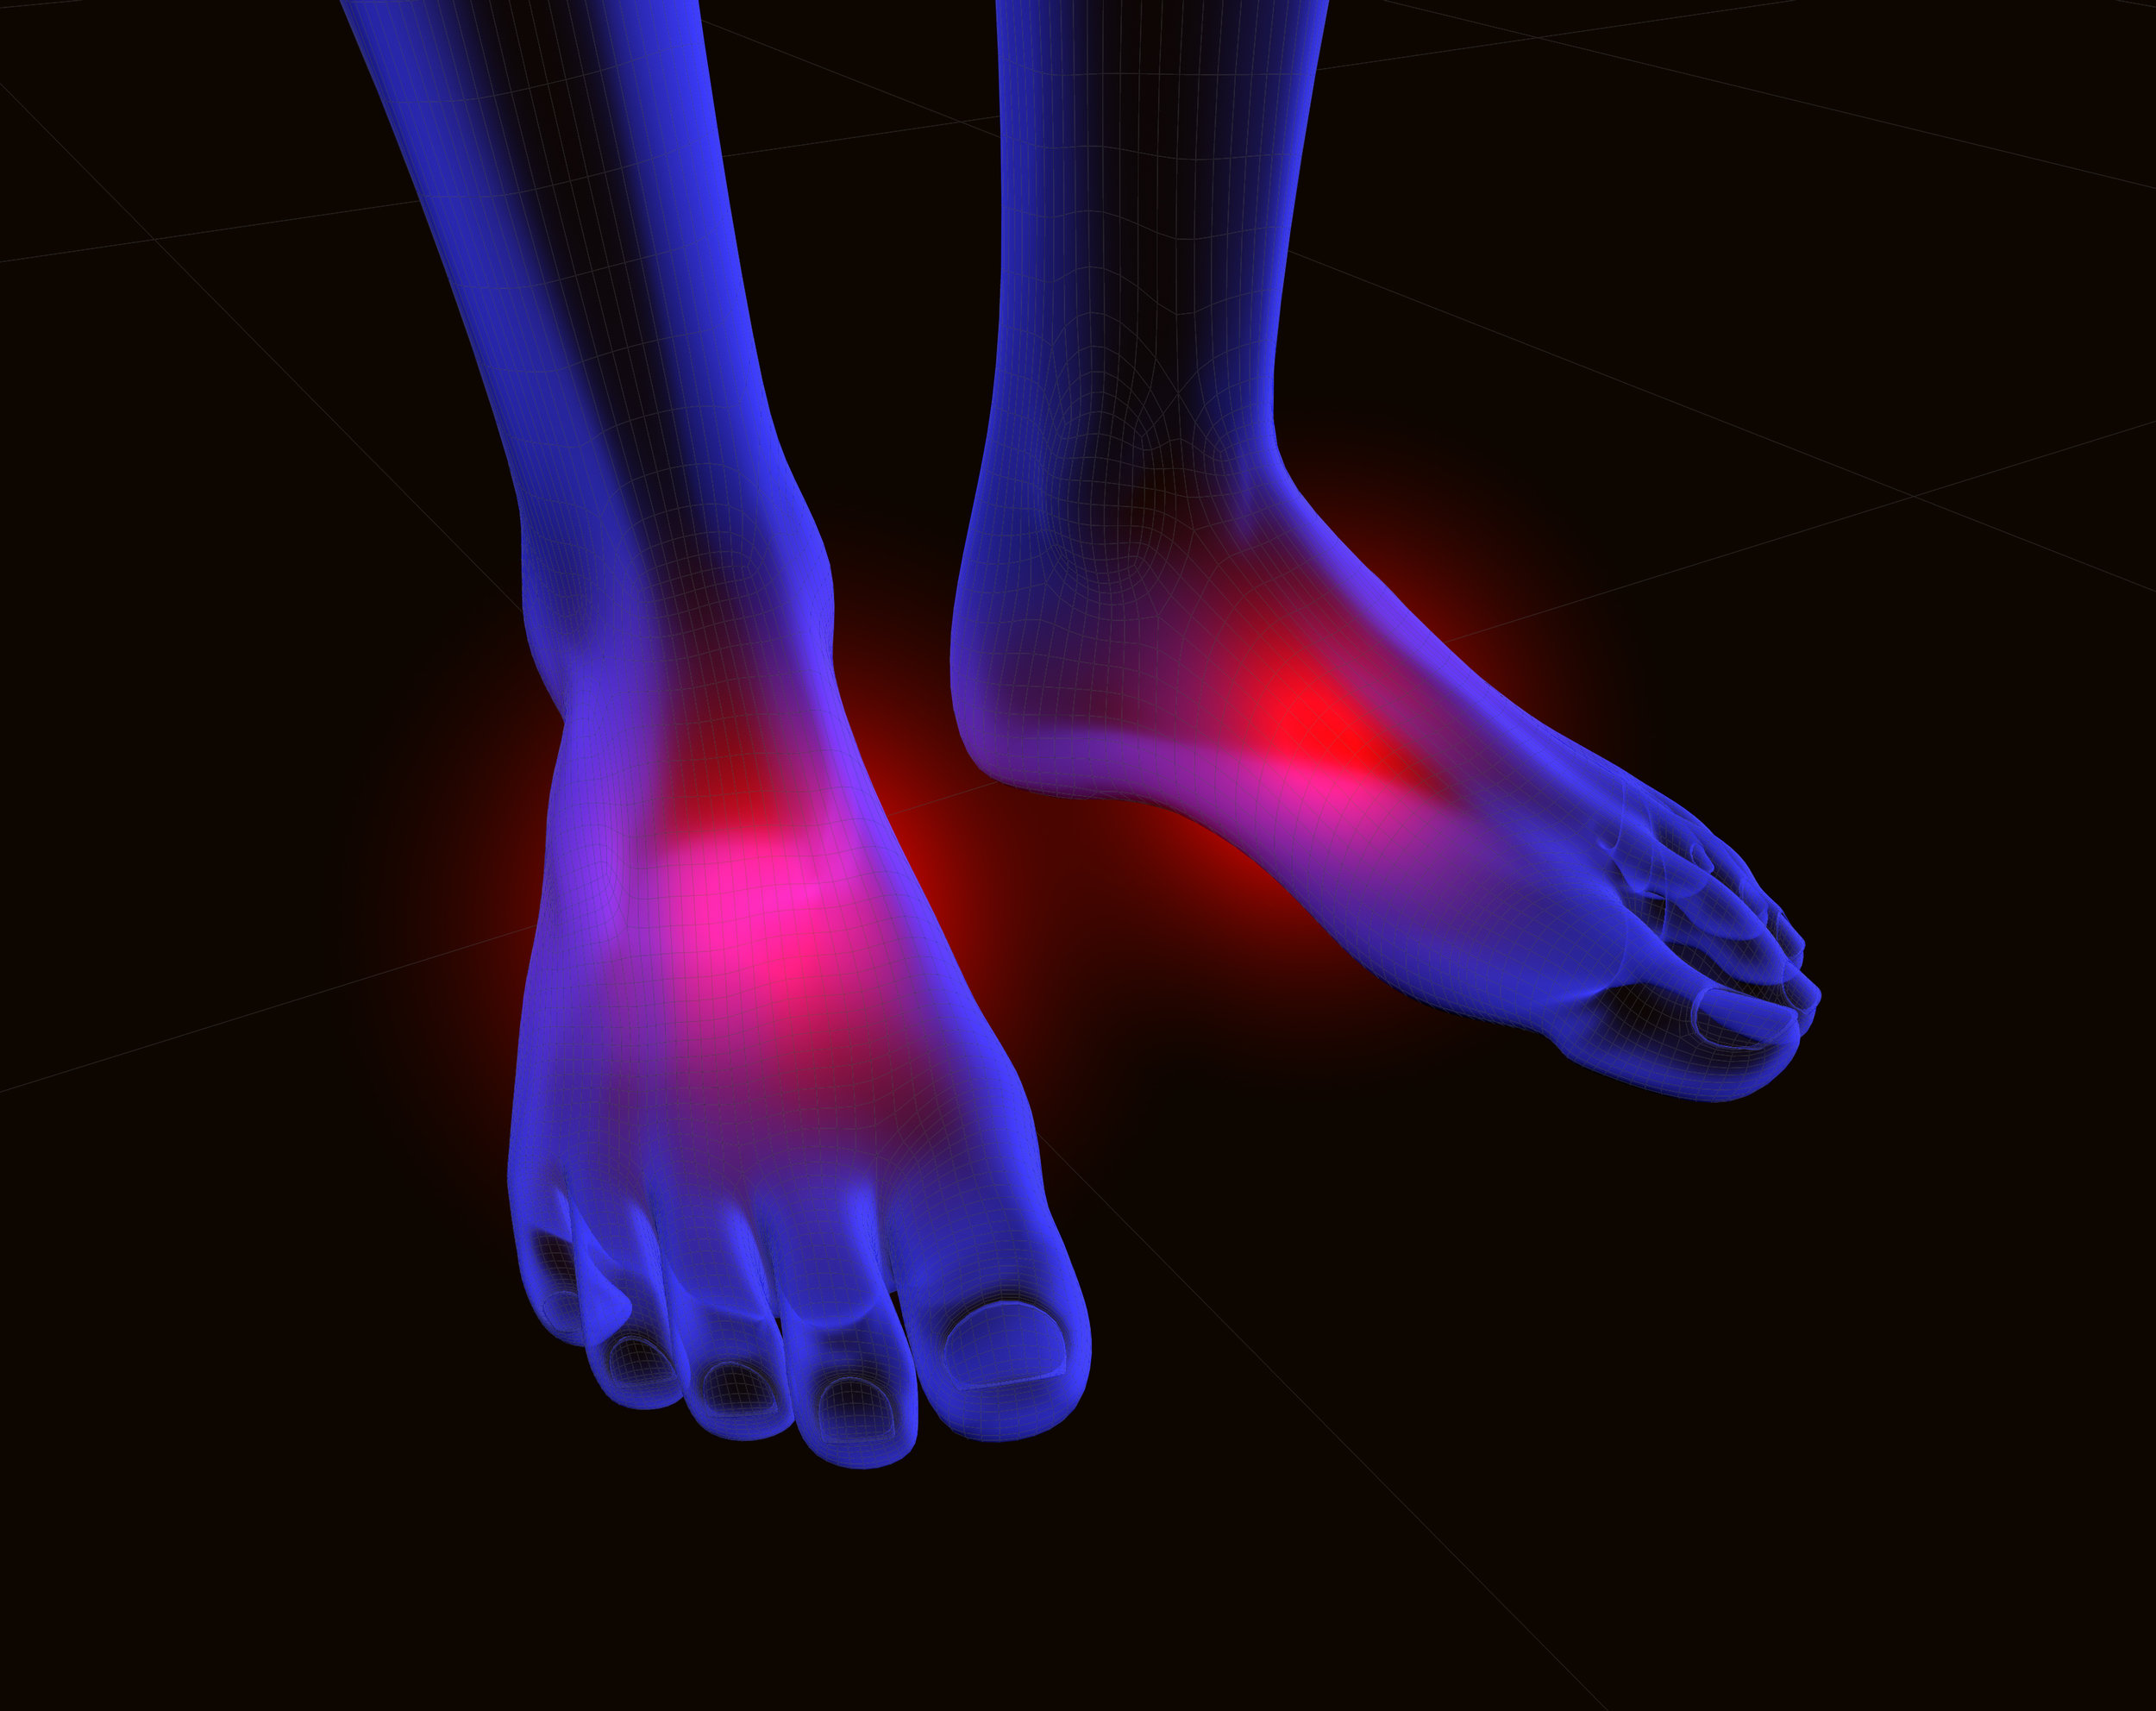 diabetic neuropathy pain treatment bath beach brooklyn podiatrist Mantzoukas